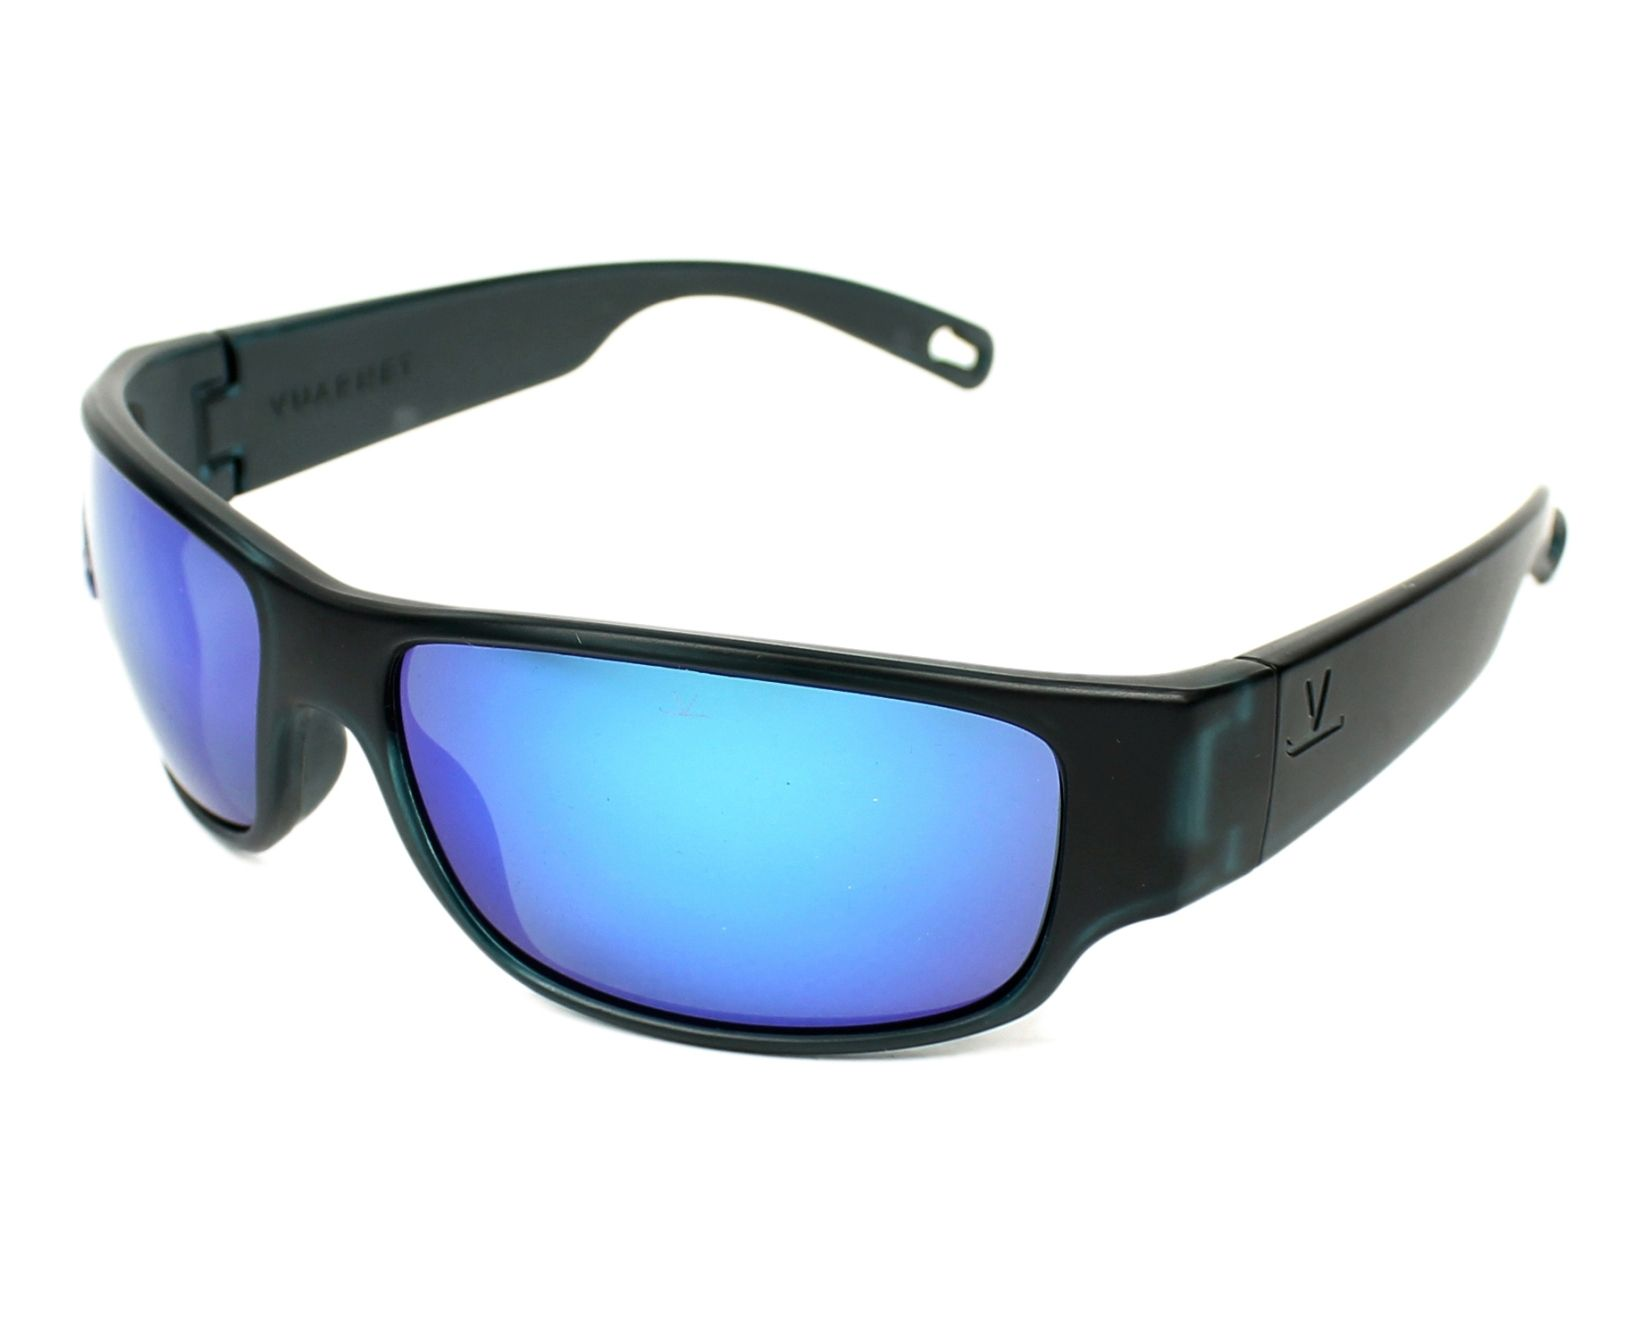 6734420826 Sunglasses Vuarnet VL-1621 0006-1626 65-17 Black Grey profile view